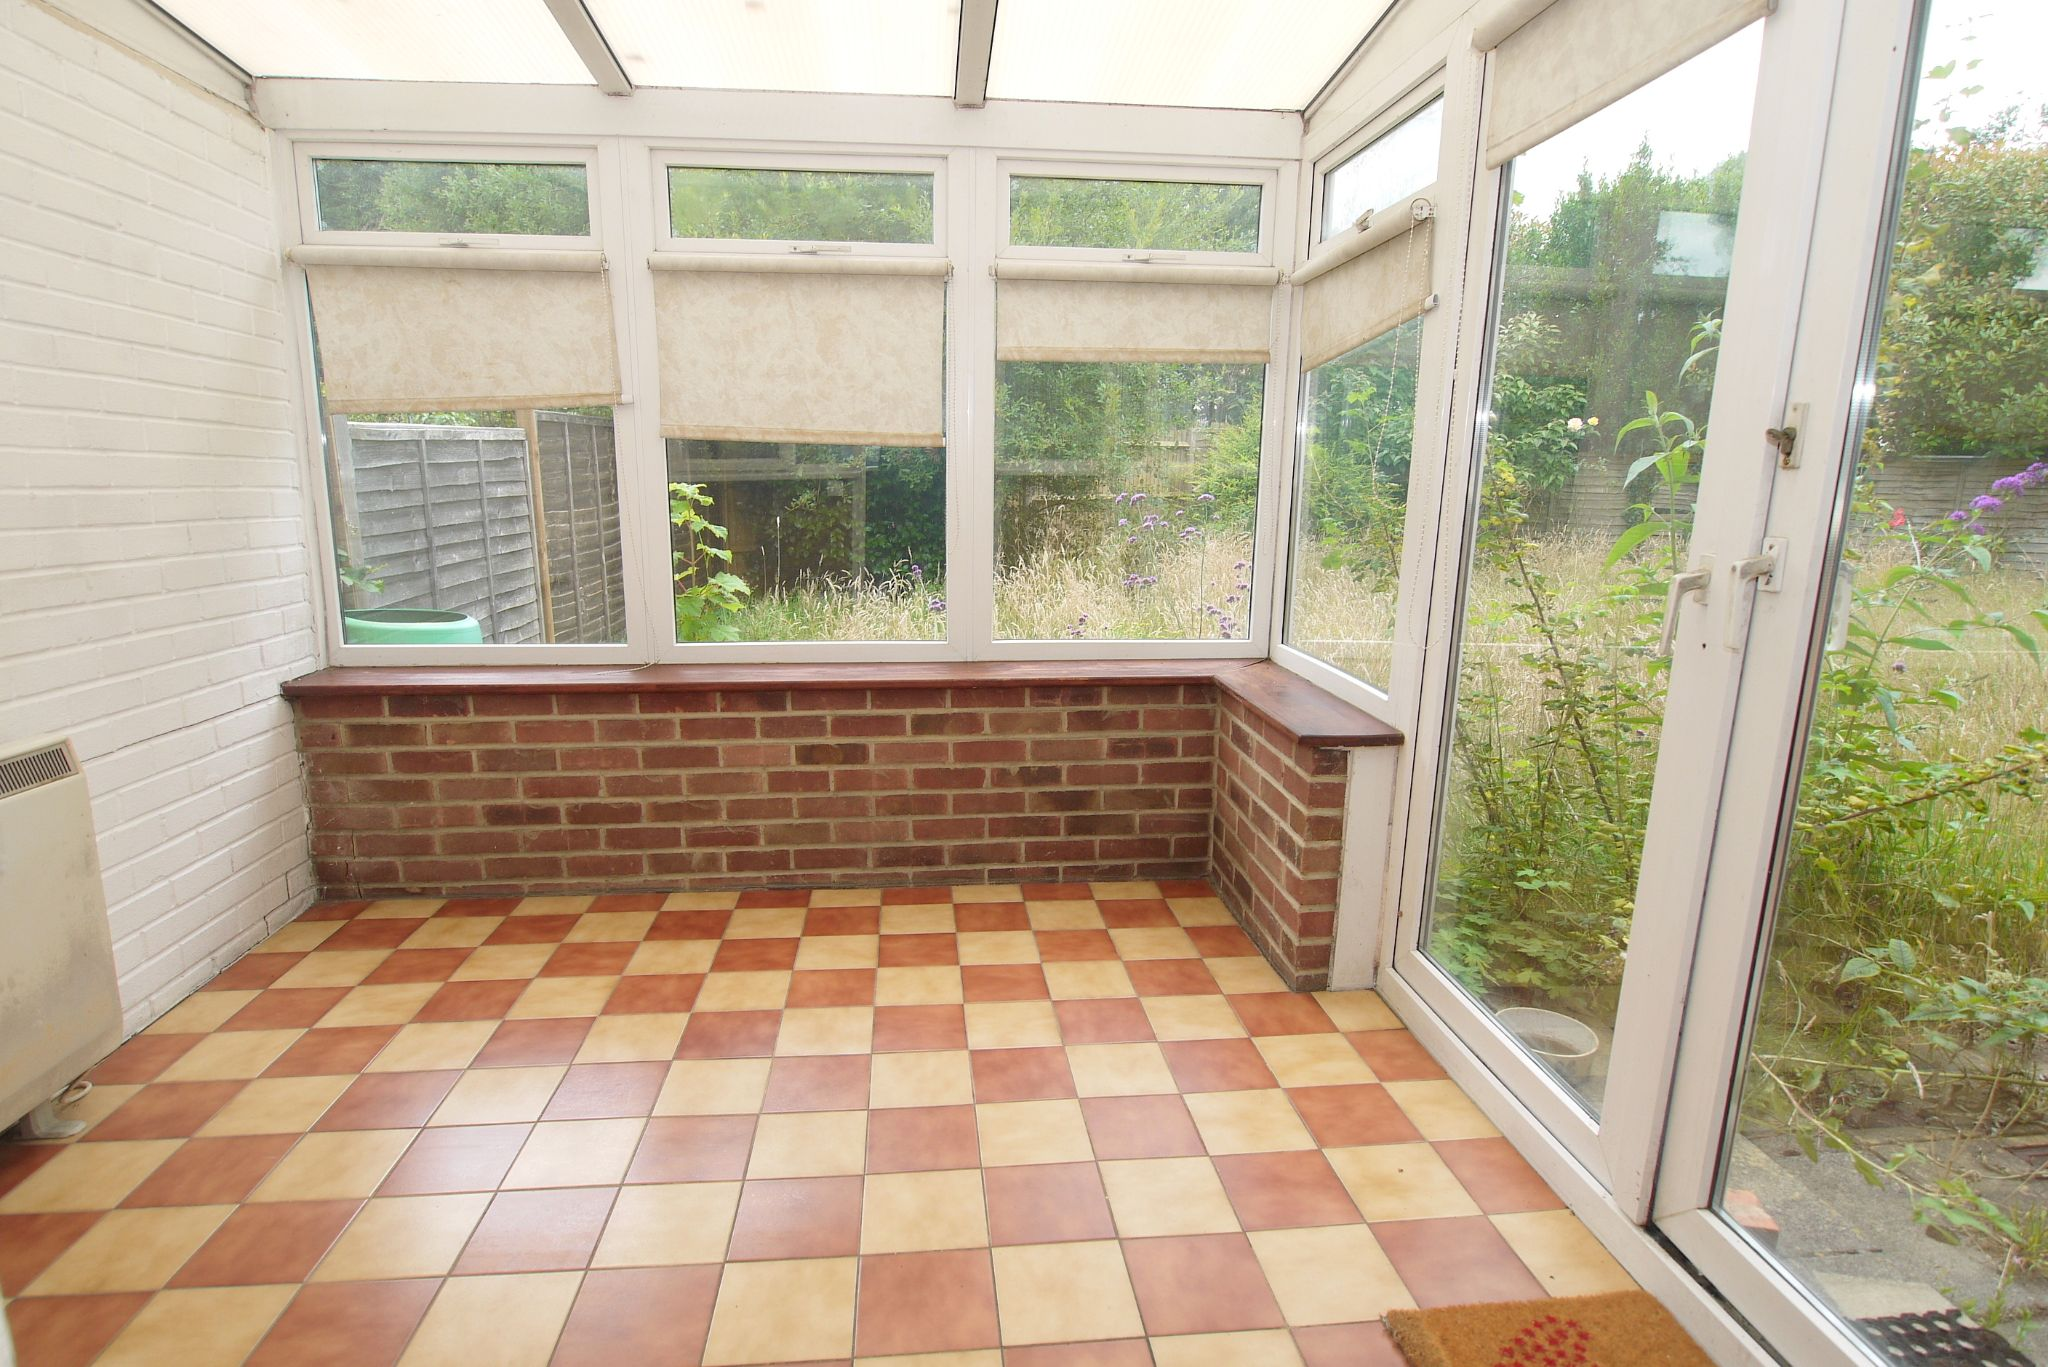 5 bedroom semi-detached house Sold in Sevenoaks - Photograph 5